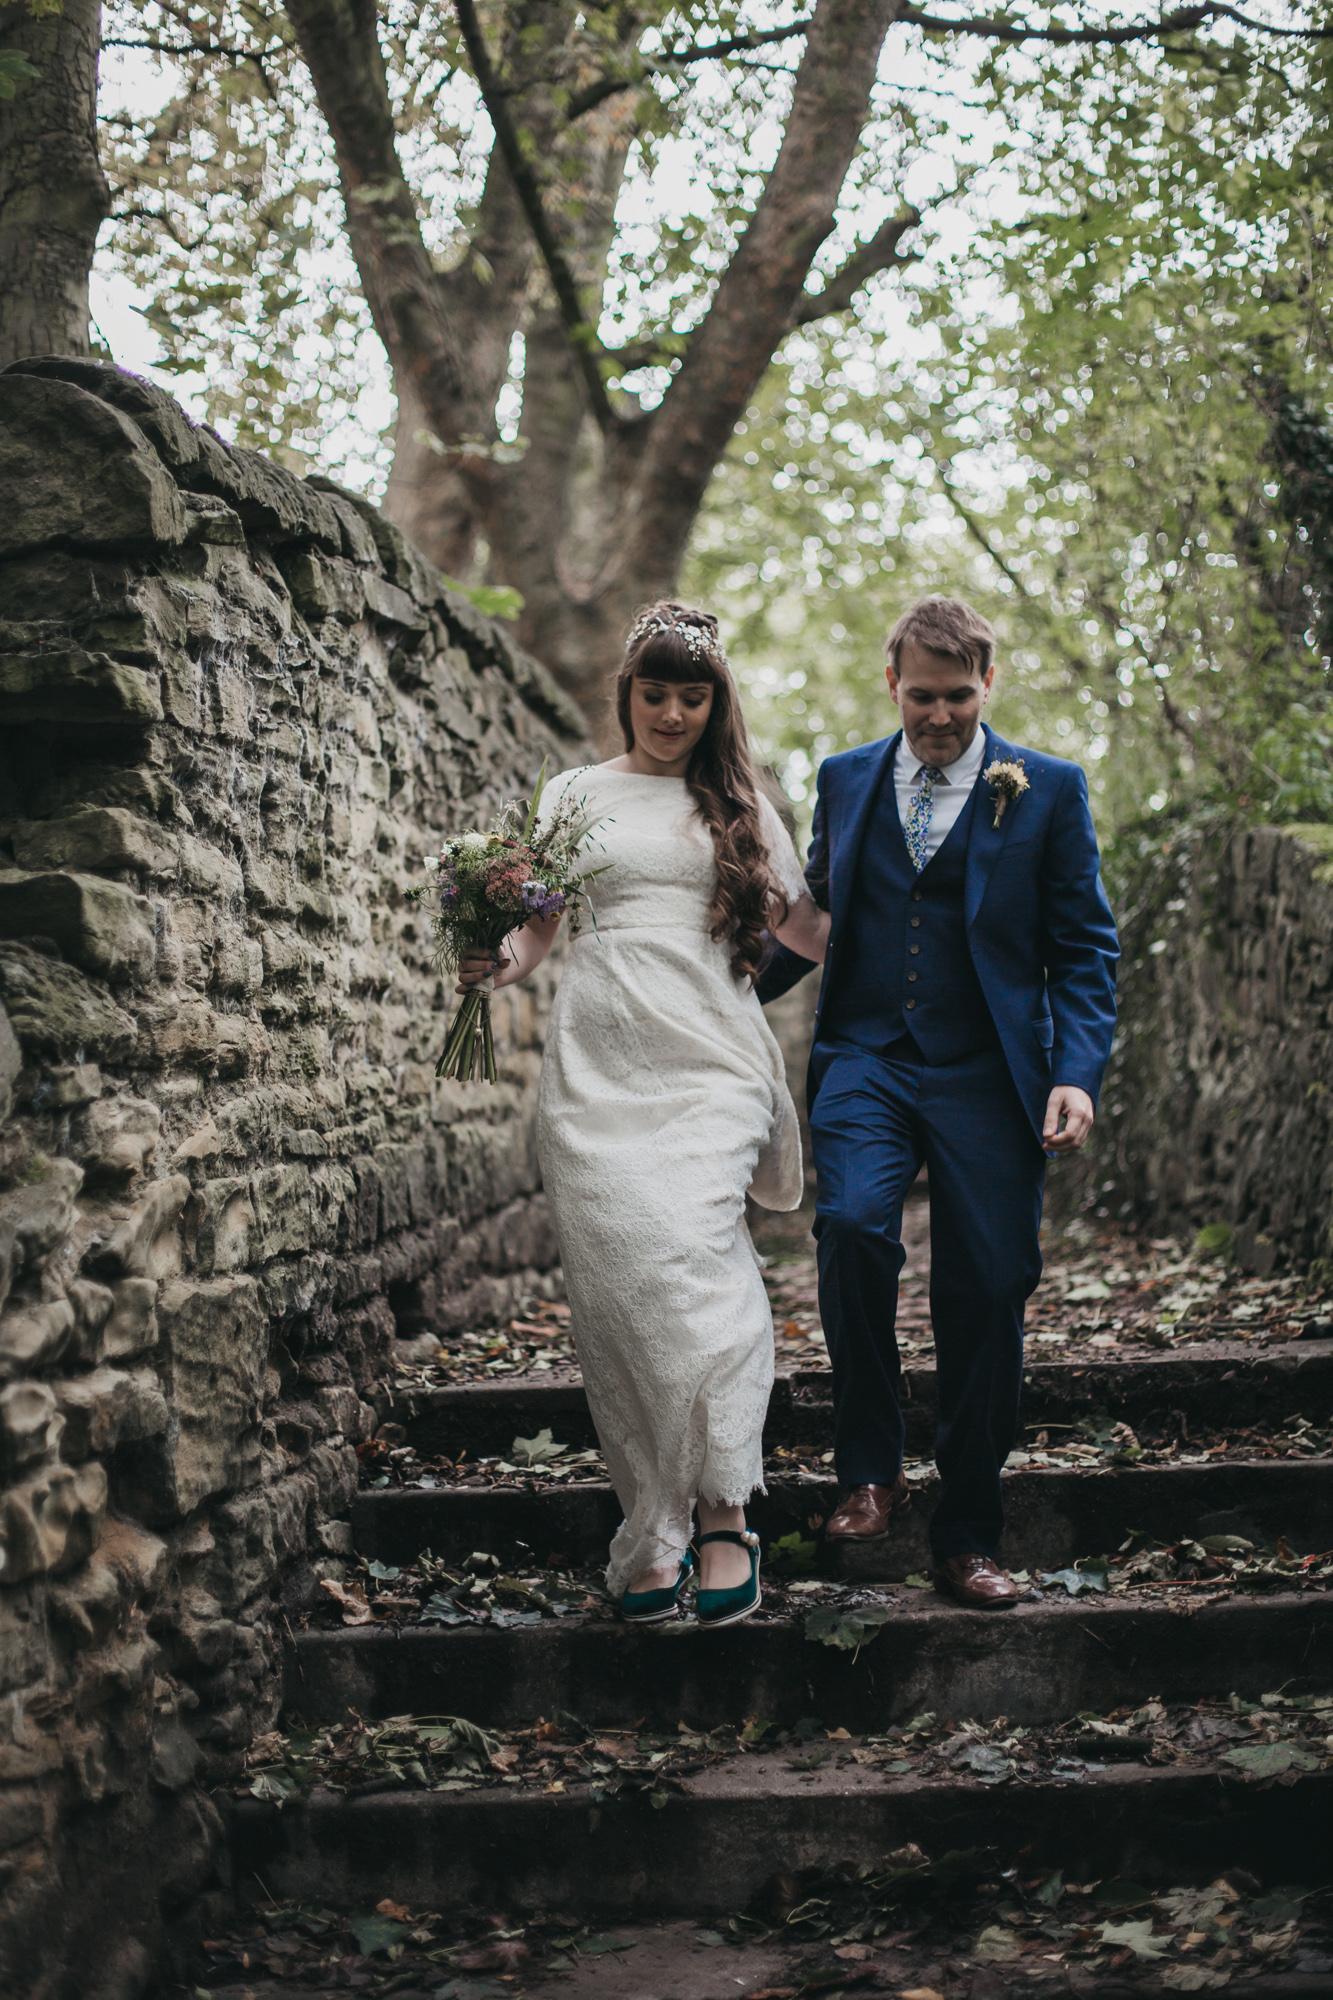 Kristy-Back-Garden-Outdoor-Wedding-Sheffield-Industrial-Warehouse-Wedding-Bohemian-Kate-Beaumont-Dahlia-Dress-22.jpg